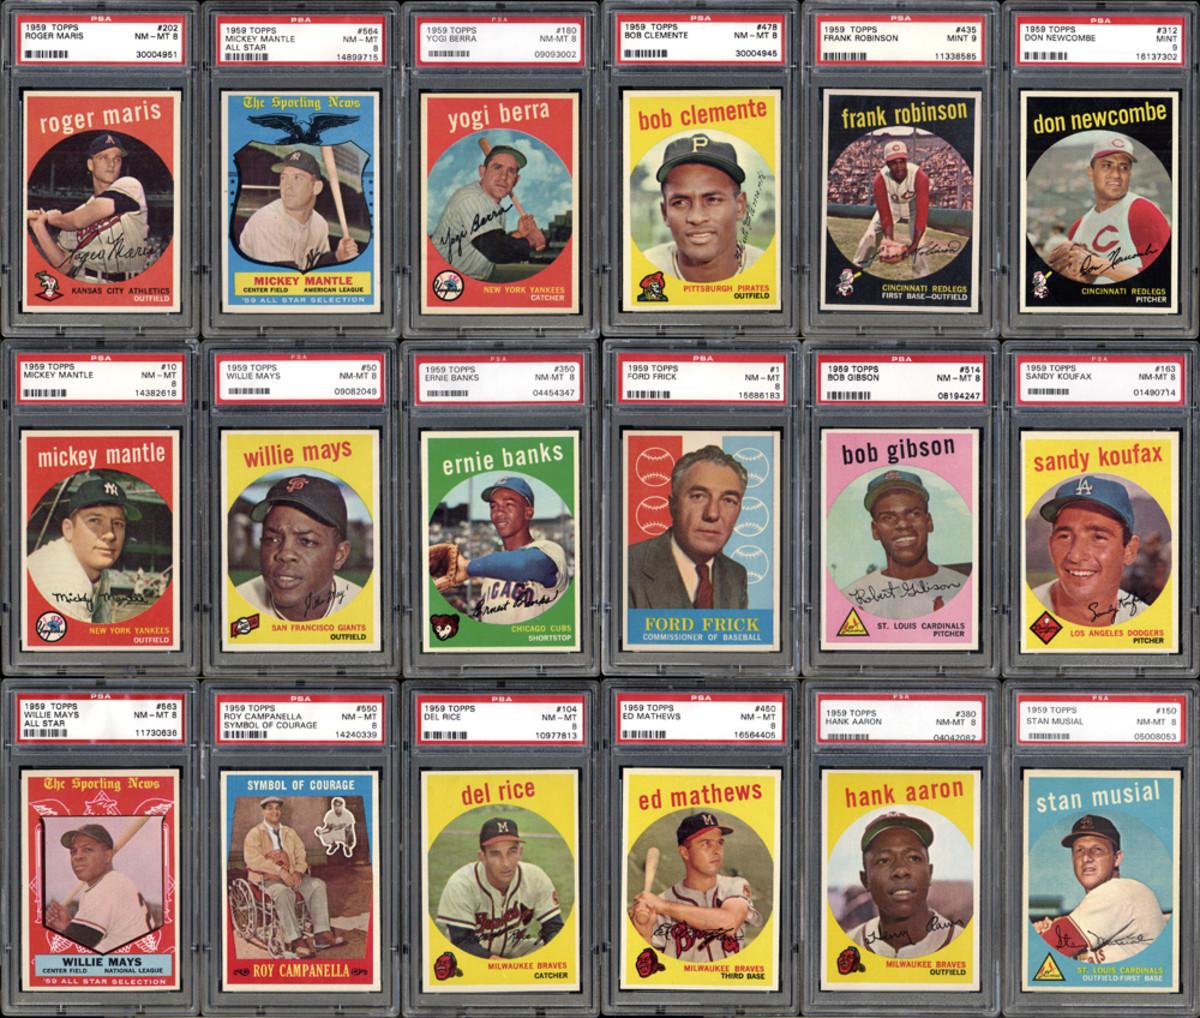 A 1959 set reached $42,939.